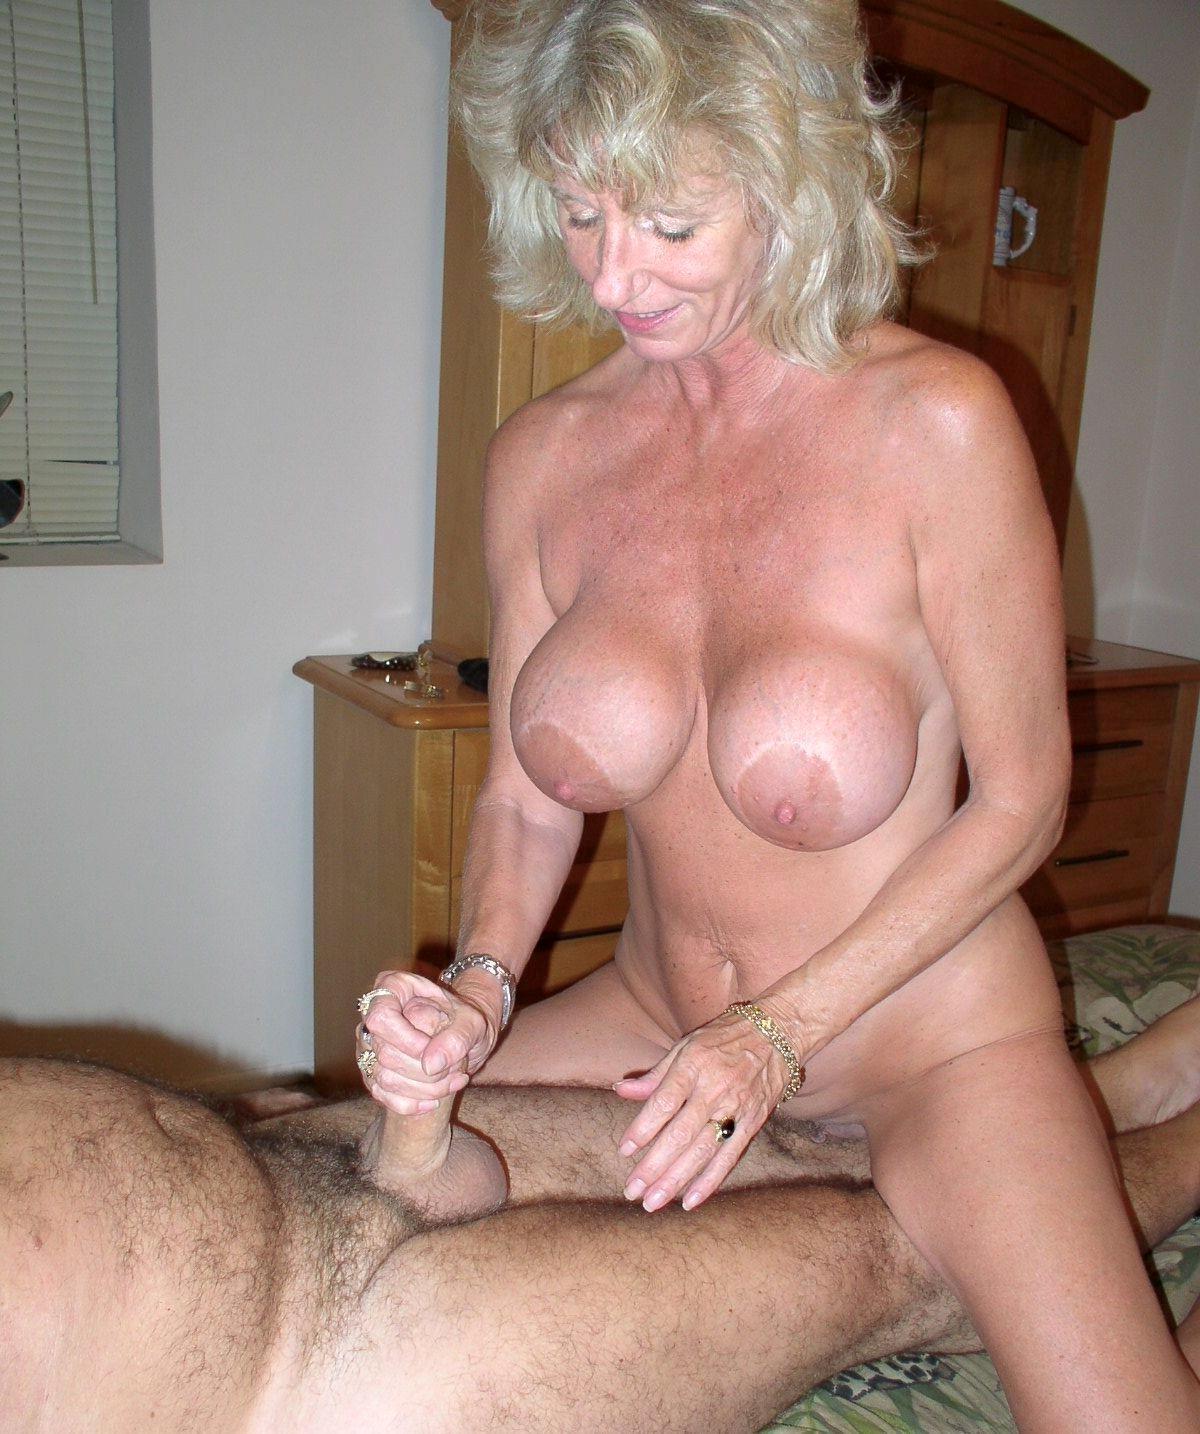 Free older woman sex pics